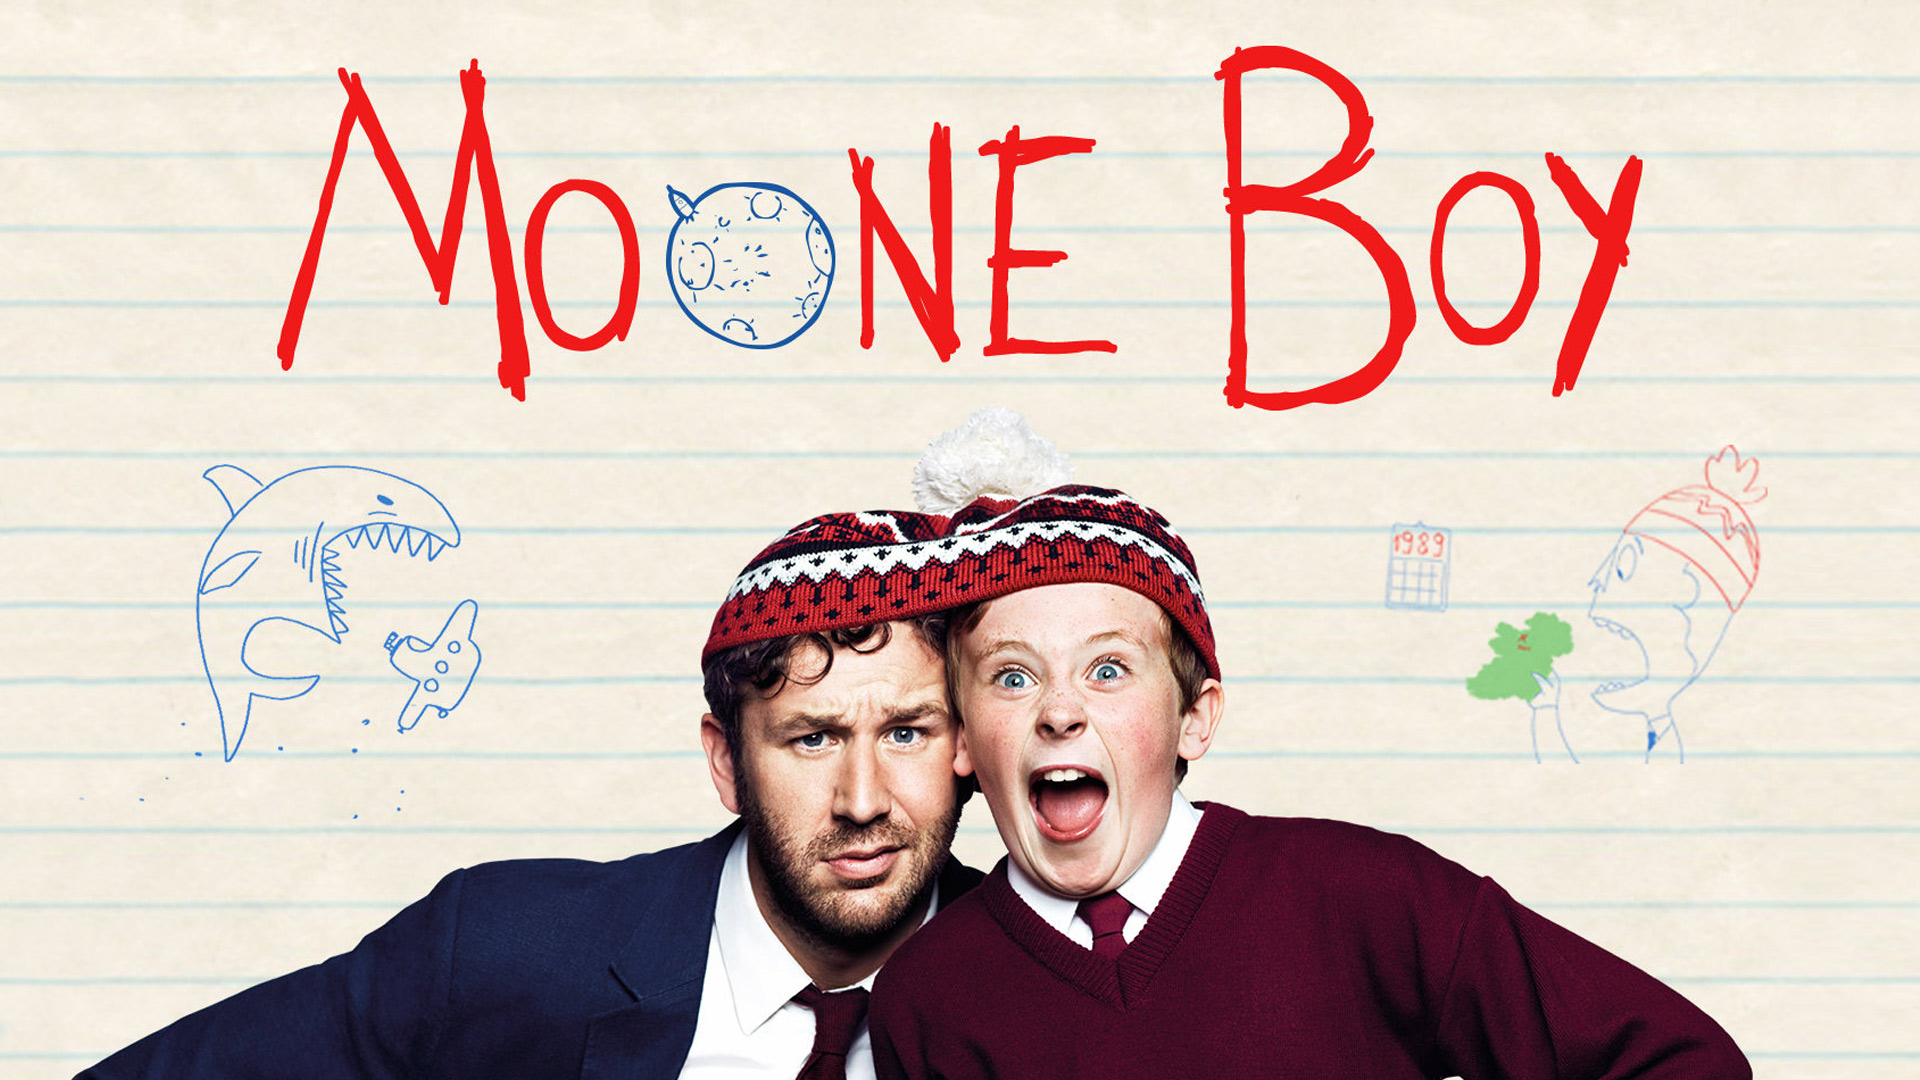 Moone Boy, Season 1